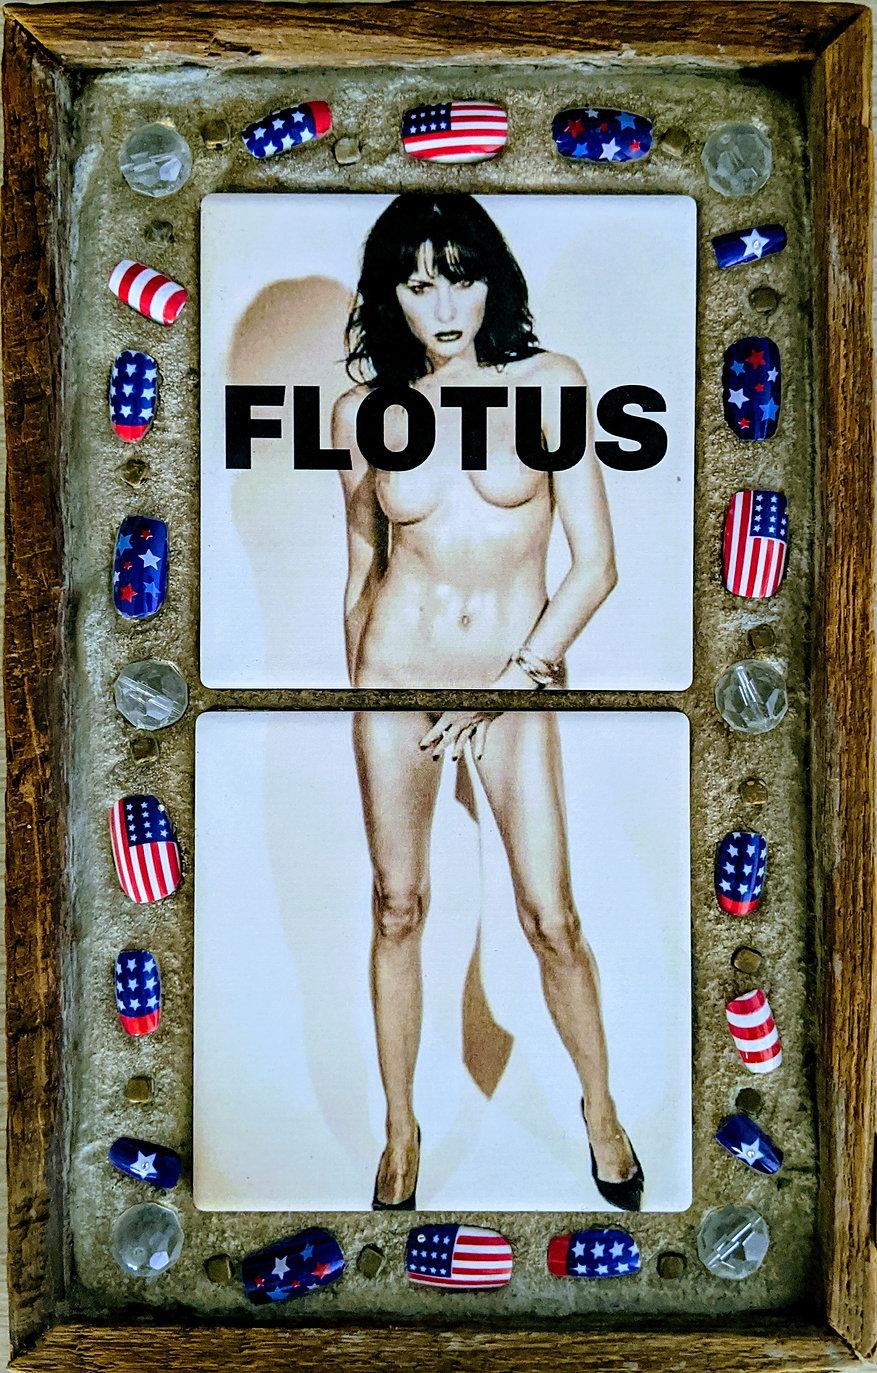 FLOTUS_mosaic.jpg